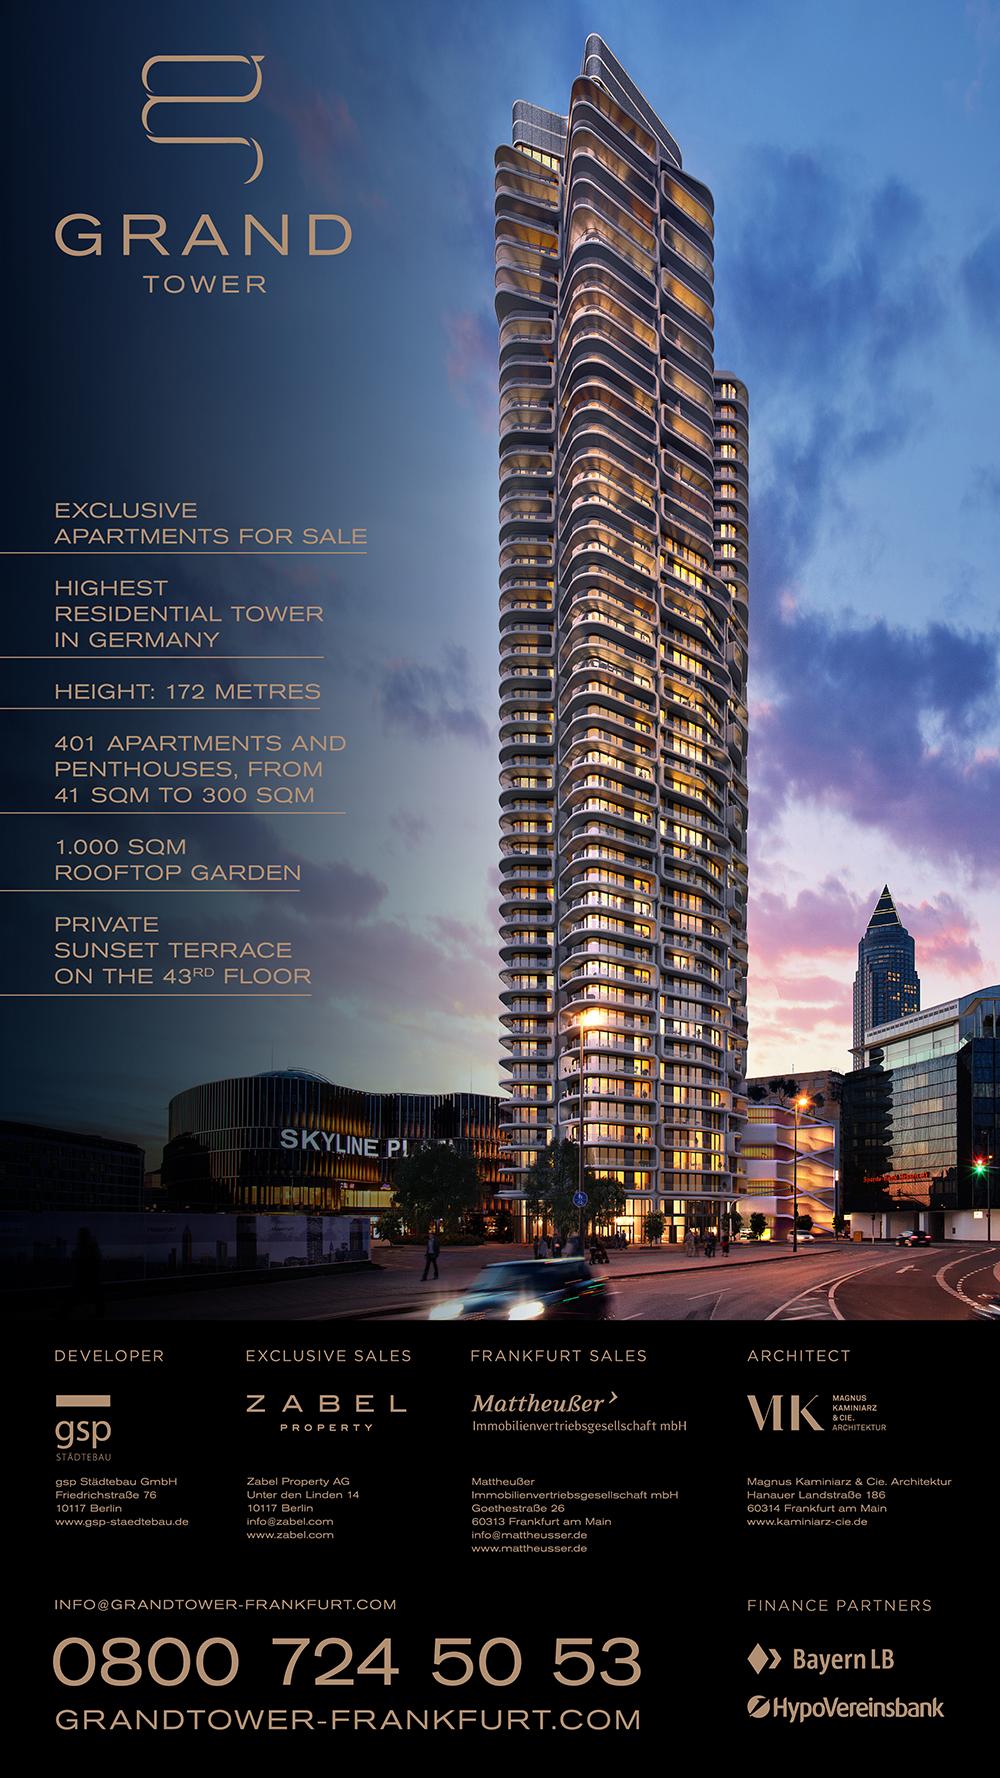 grand tower stern gmbh agentur f r kommunikation. Black Bedroom Furniture Sets. Home Design Ideas